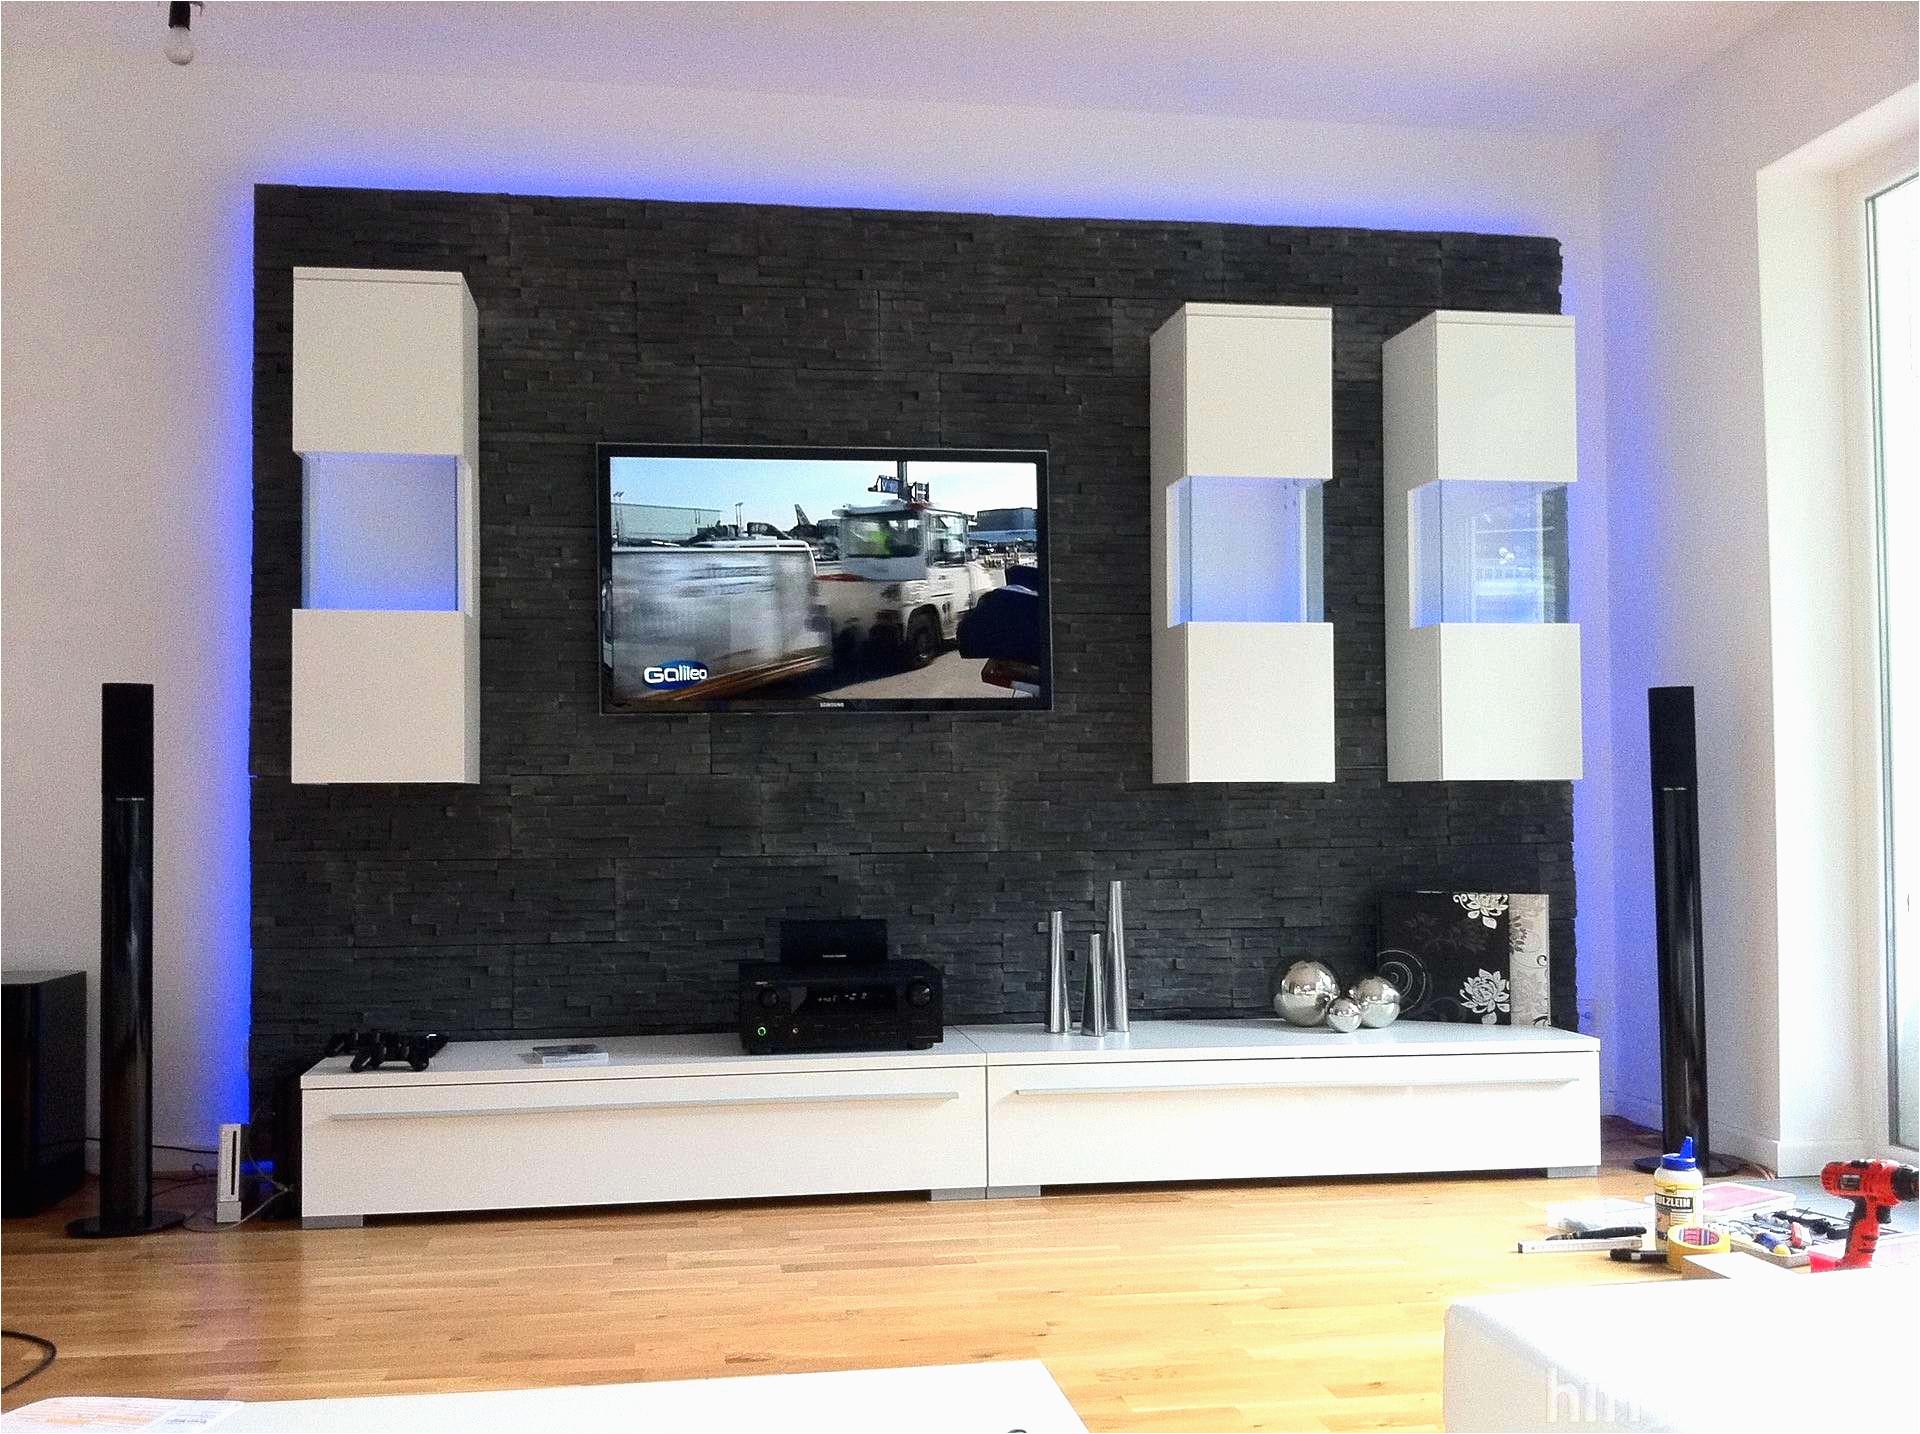 Küche Wasserhahn Schlauch Wechseln Wand Muster Ideen